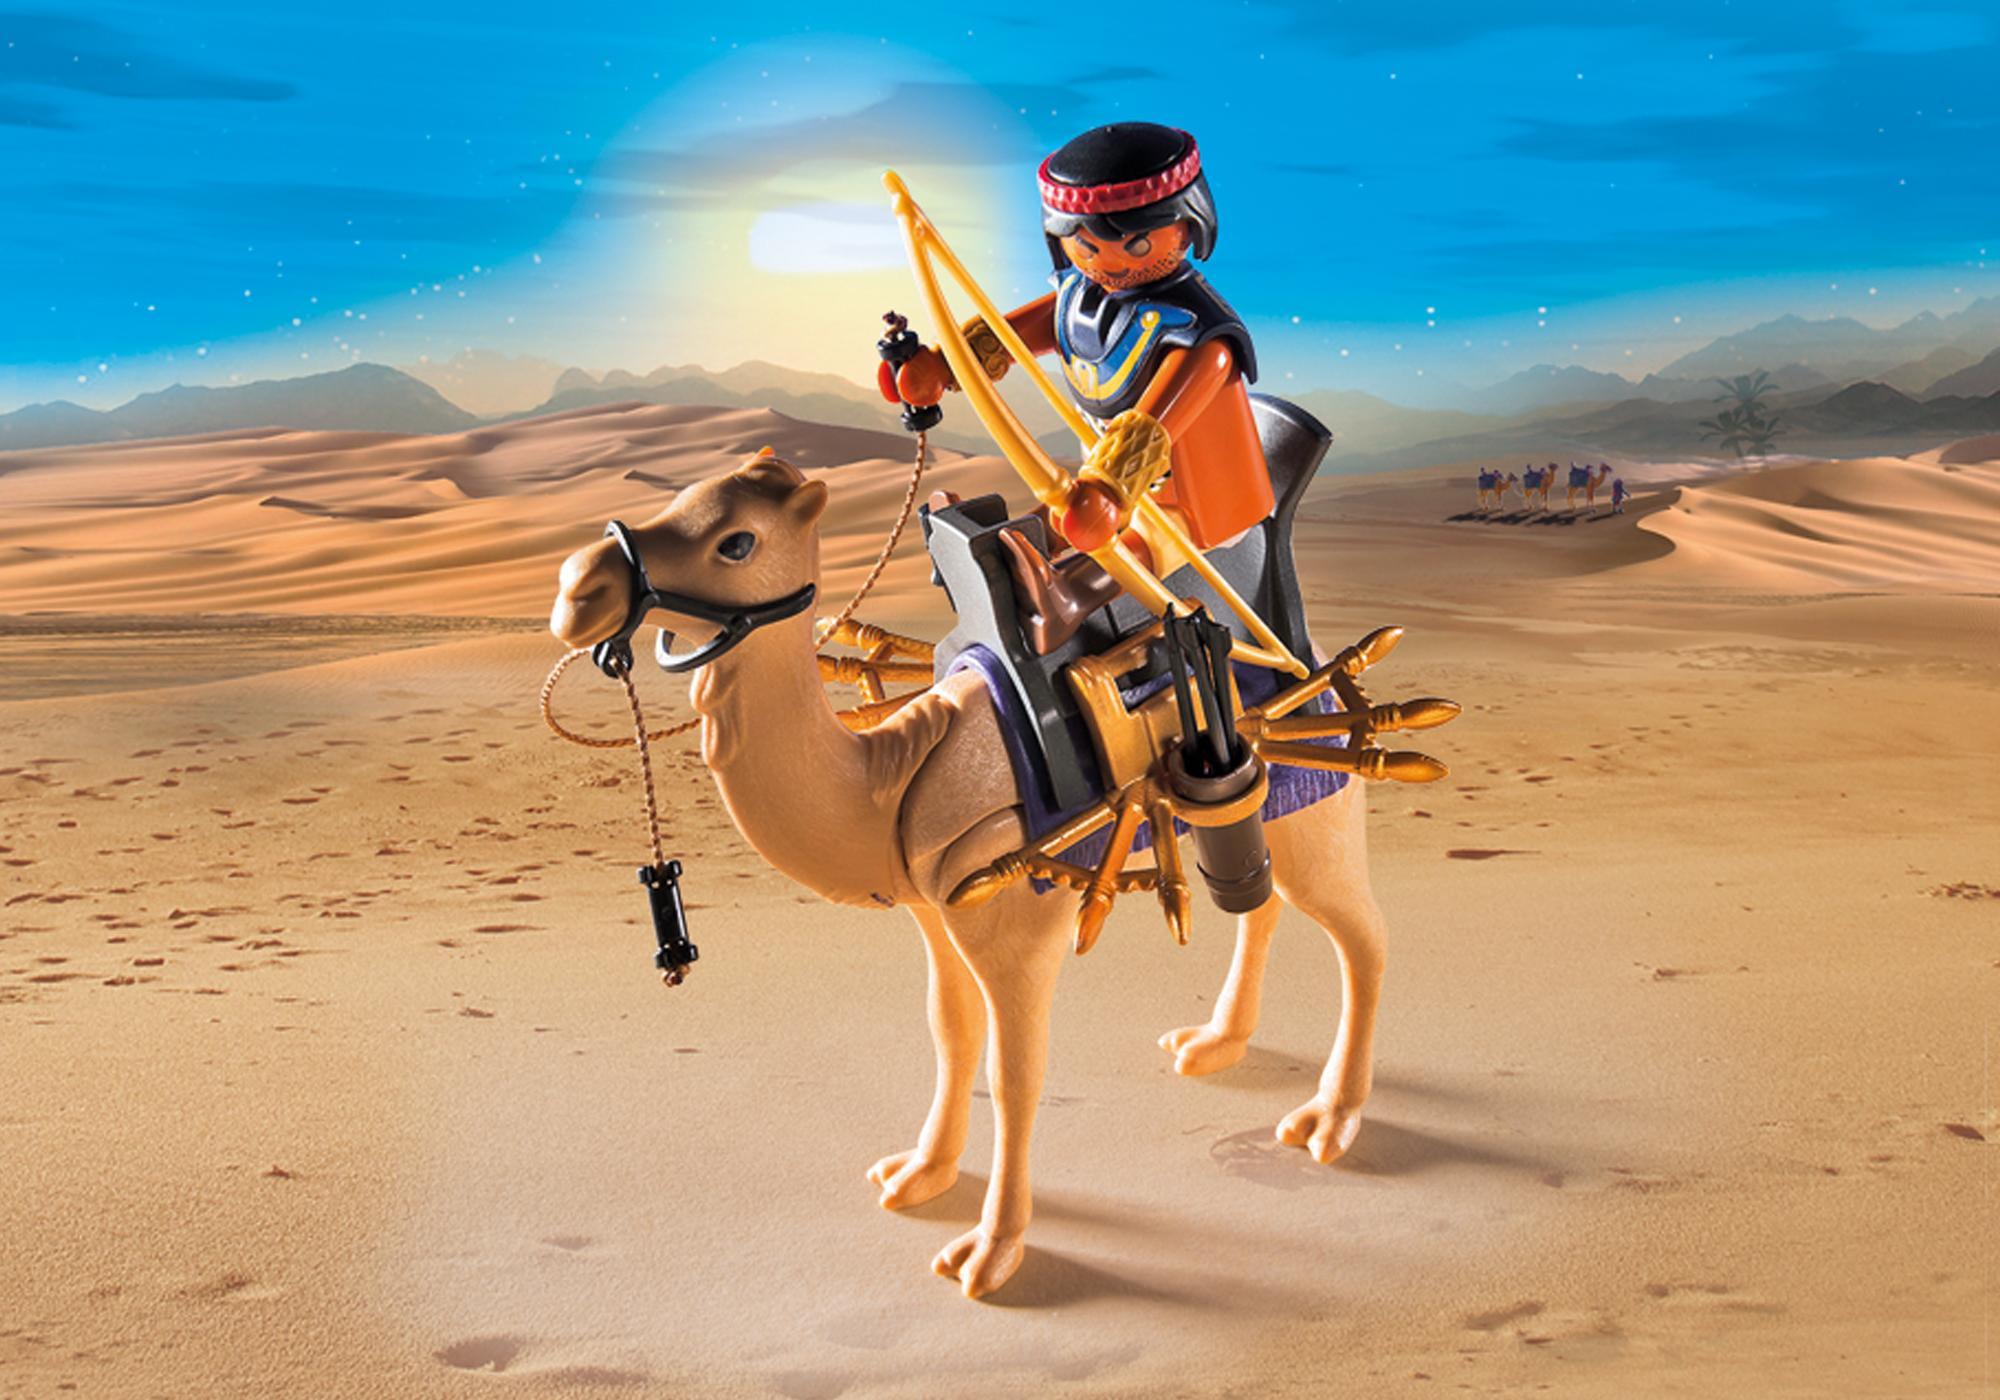 http://media.playmobil.com/i/playmobil/9167_product_extra1/Egyptian Warrior with Camel